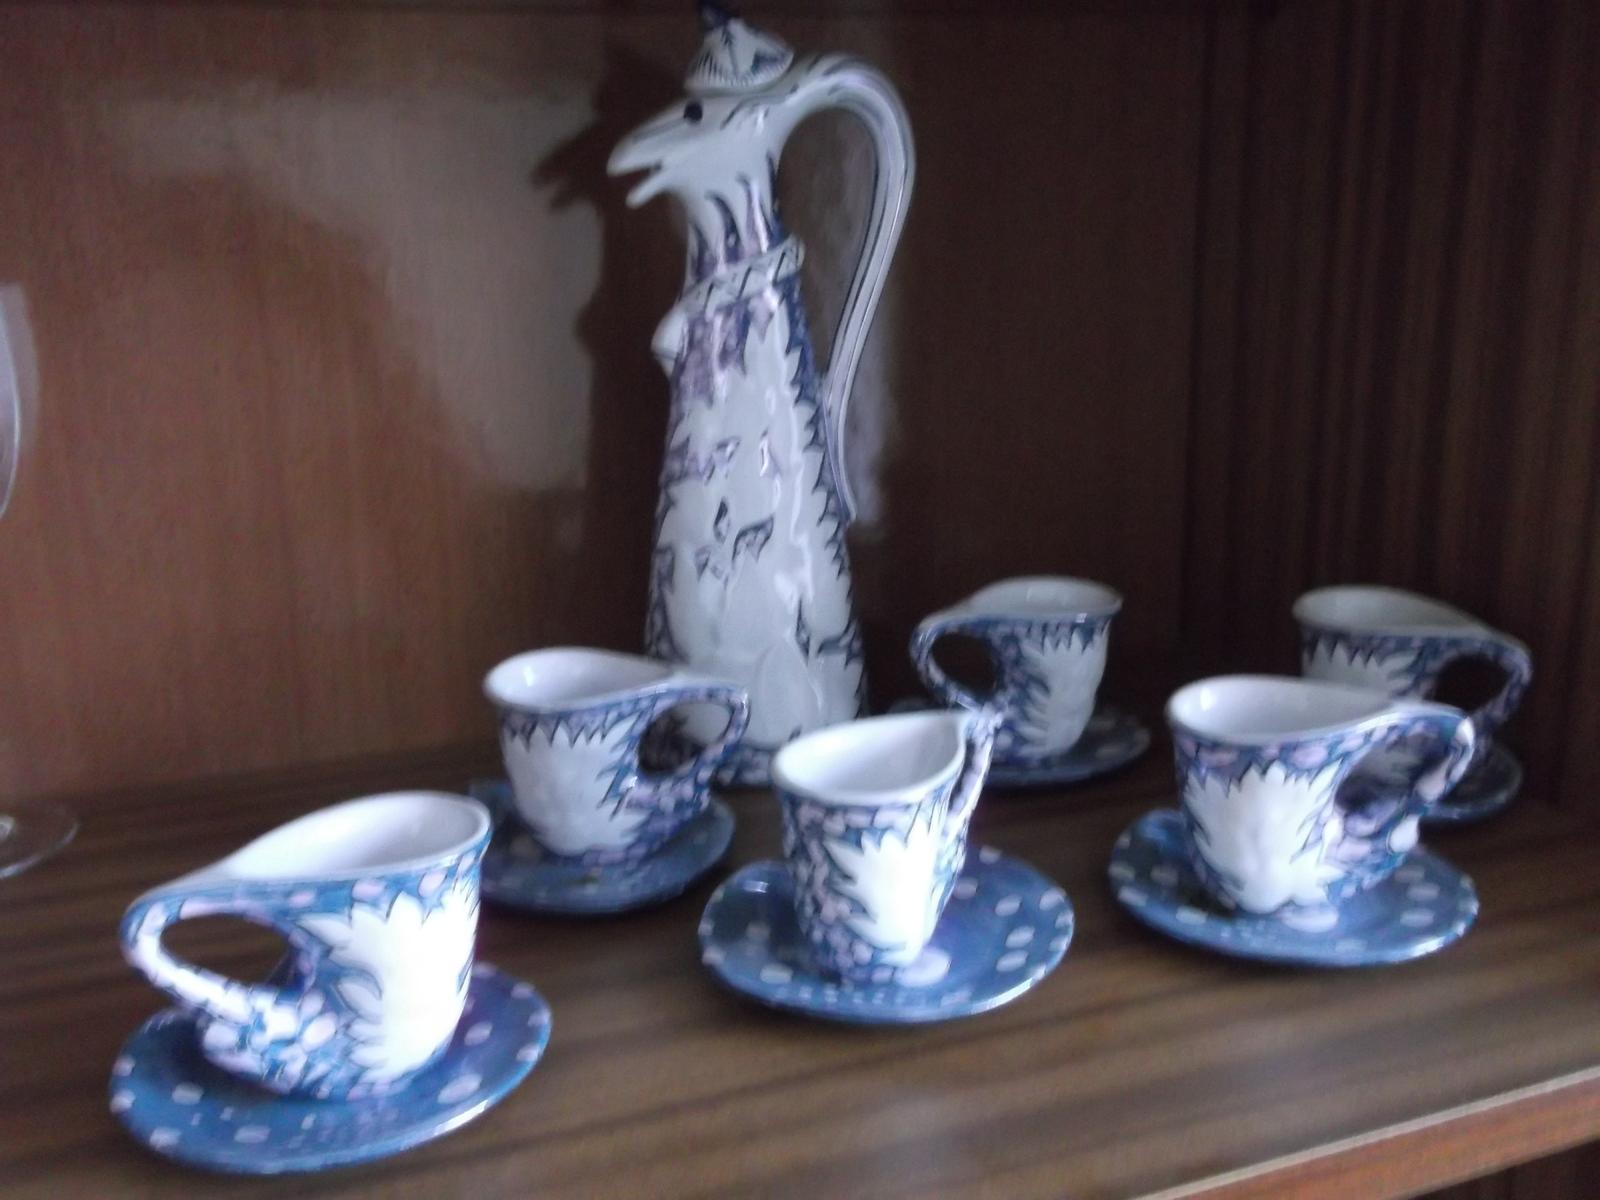 Albánsky porcelán - Obrázok č. 1